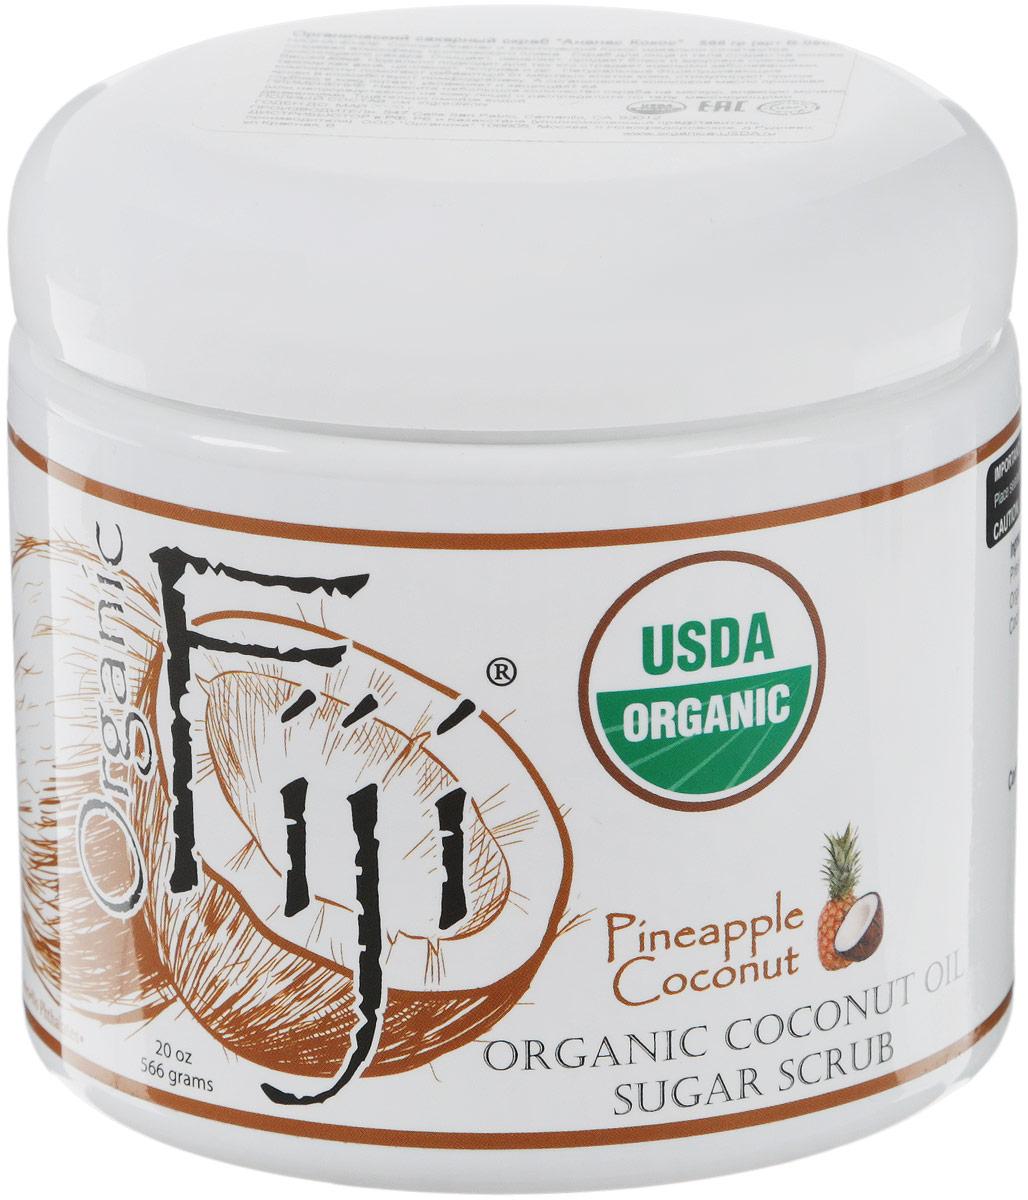 Organic Fiji Органический кокосовый скраб для лица и тела на основе тростникового сахара, ананас, 566 г skidmore organic chemistry i for dummies®